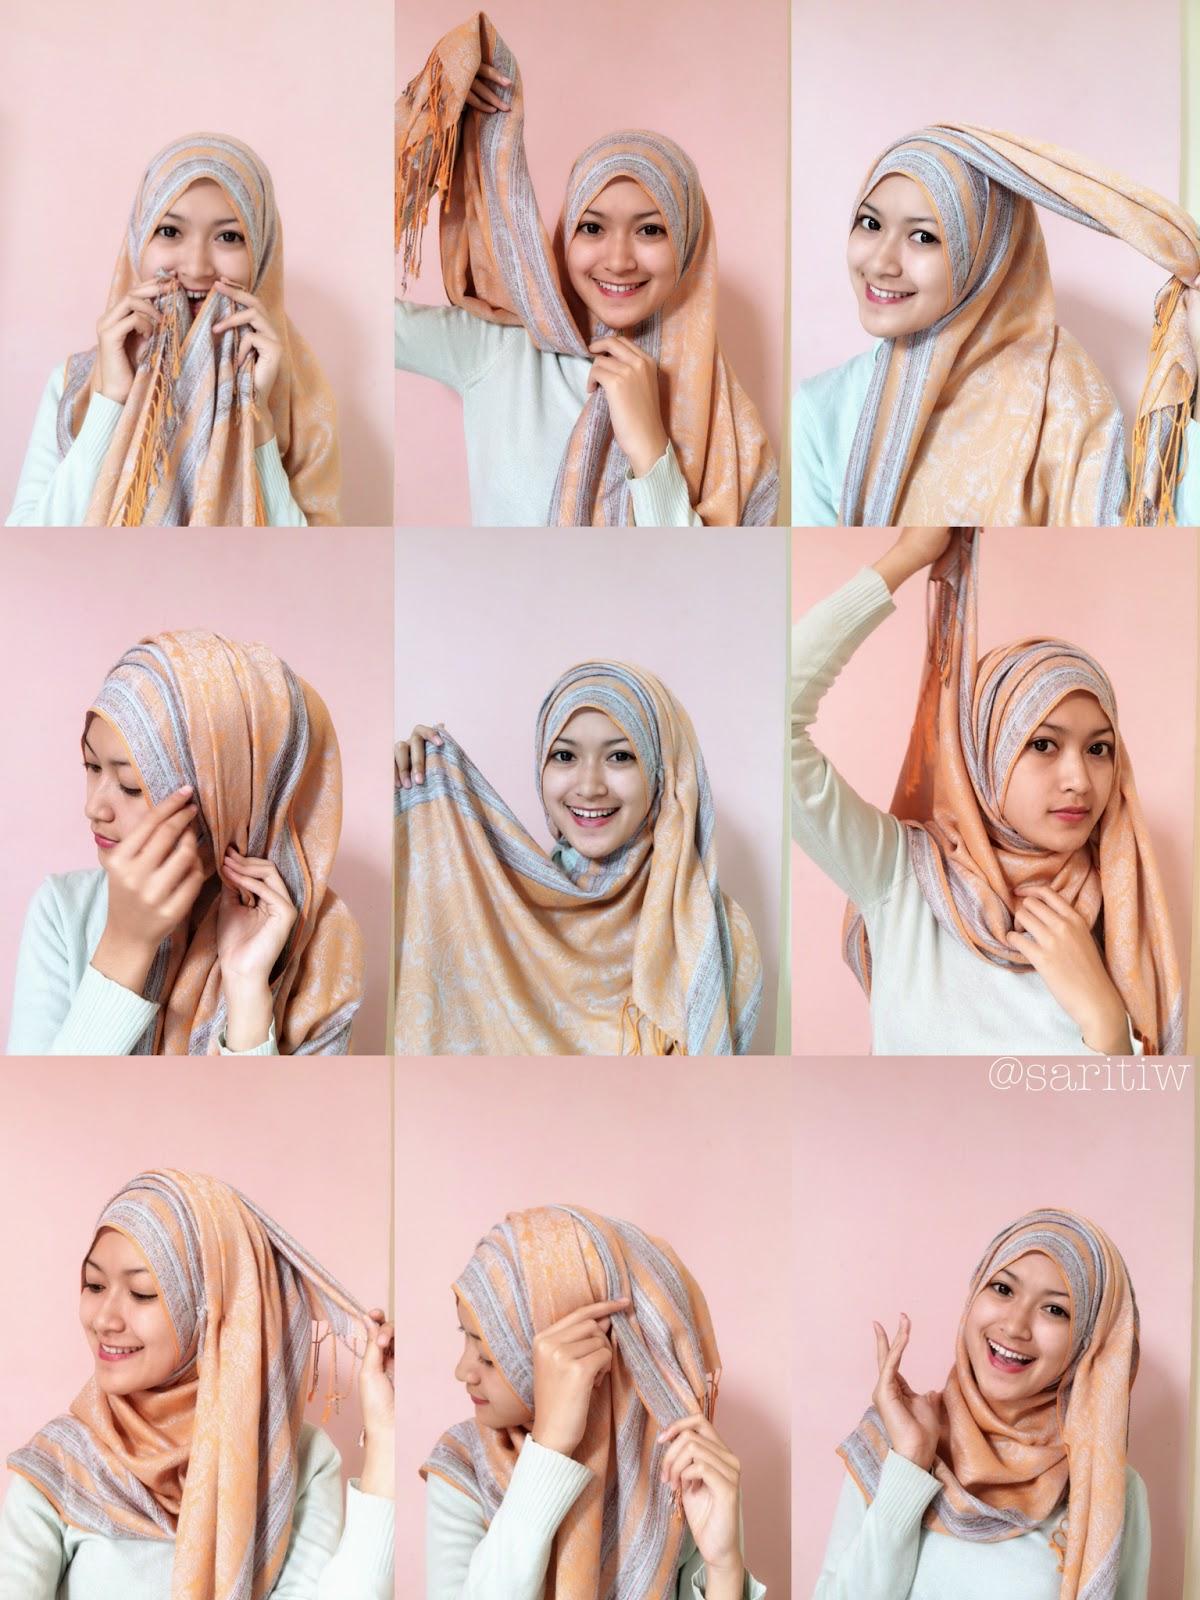 88 Gambar Menarik Tutorial Hijab Pashmina Rawis Kusut Tahun 2017